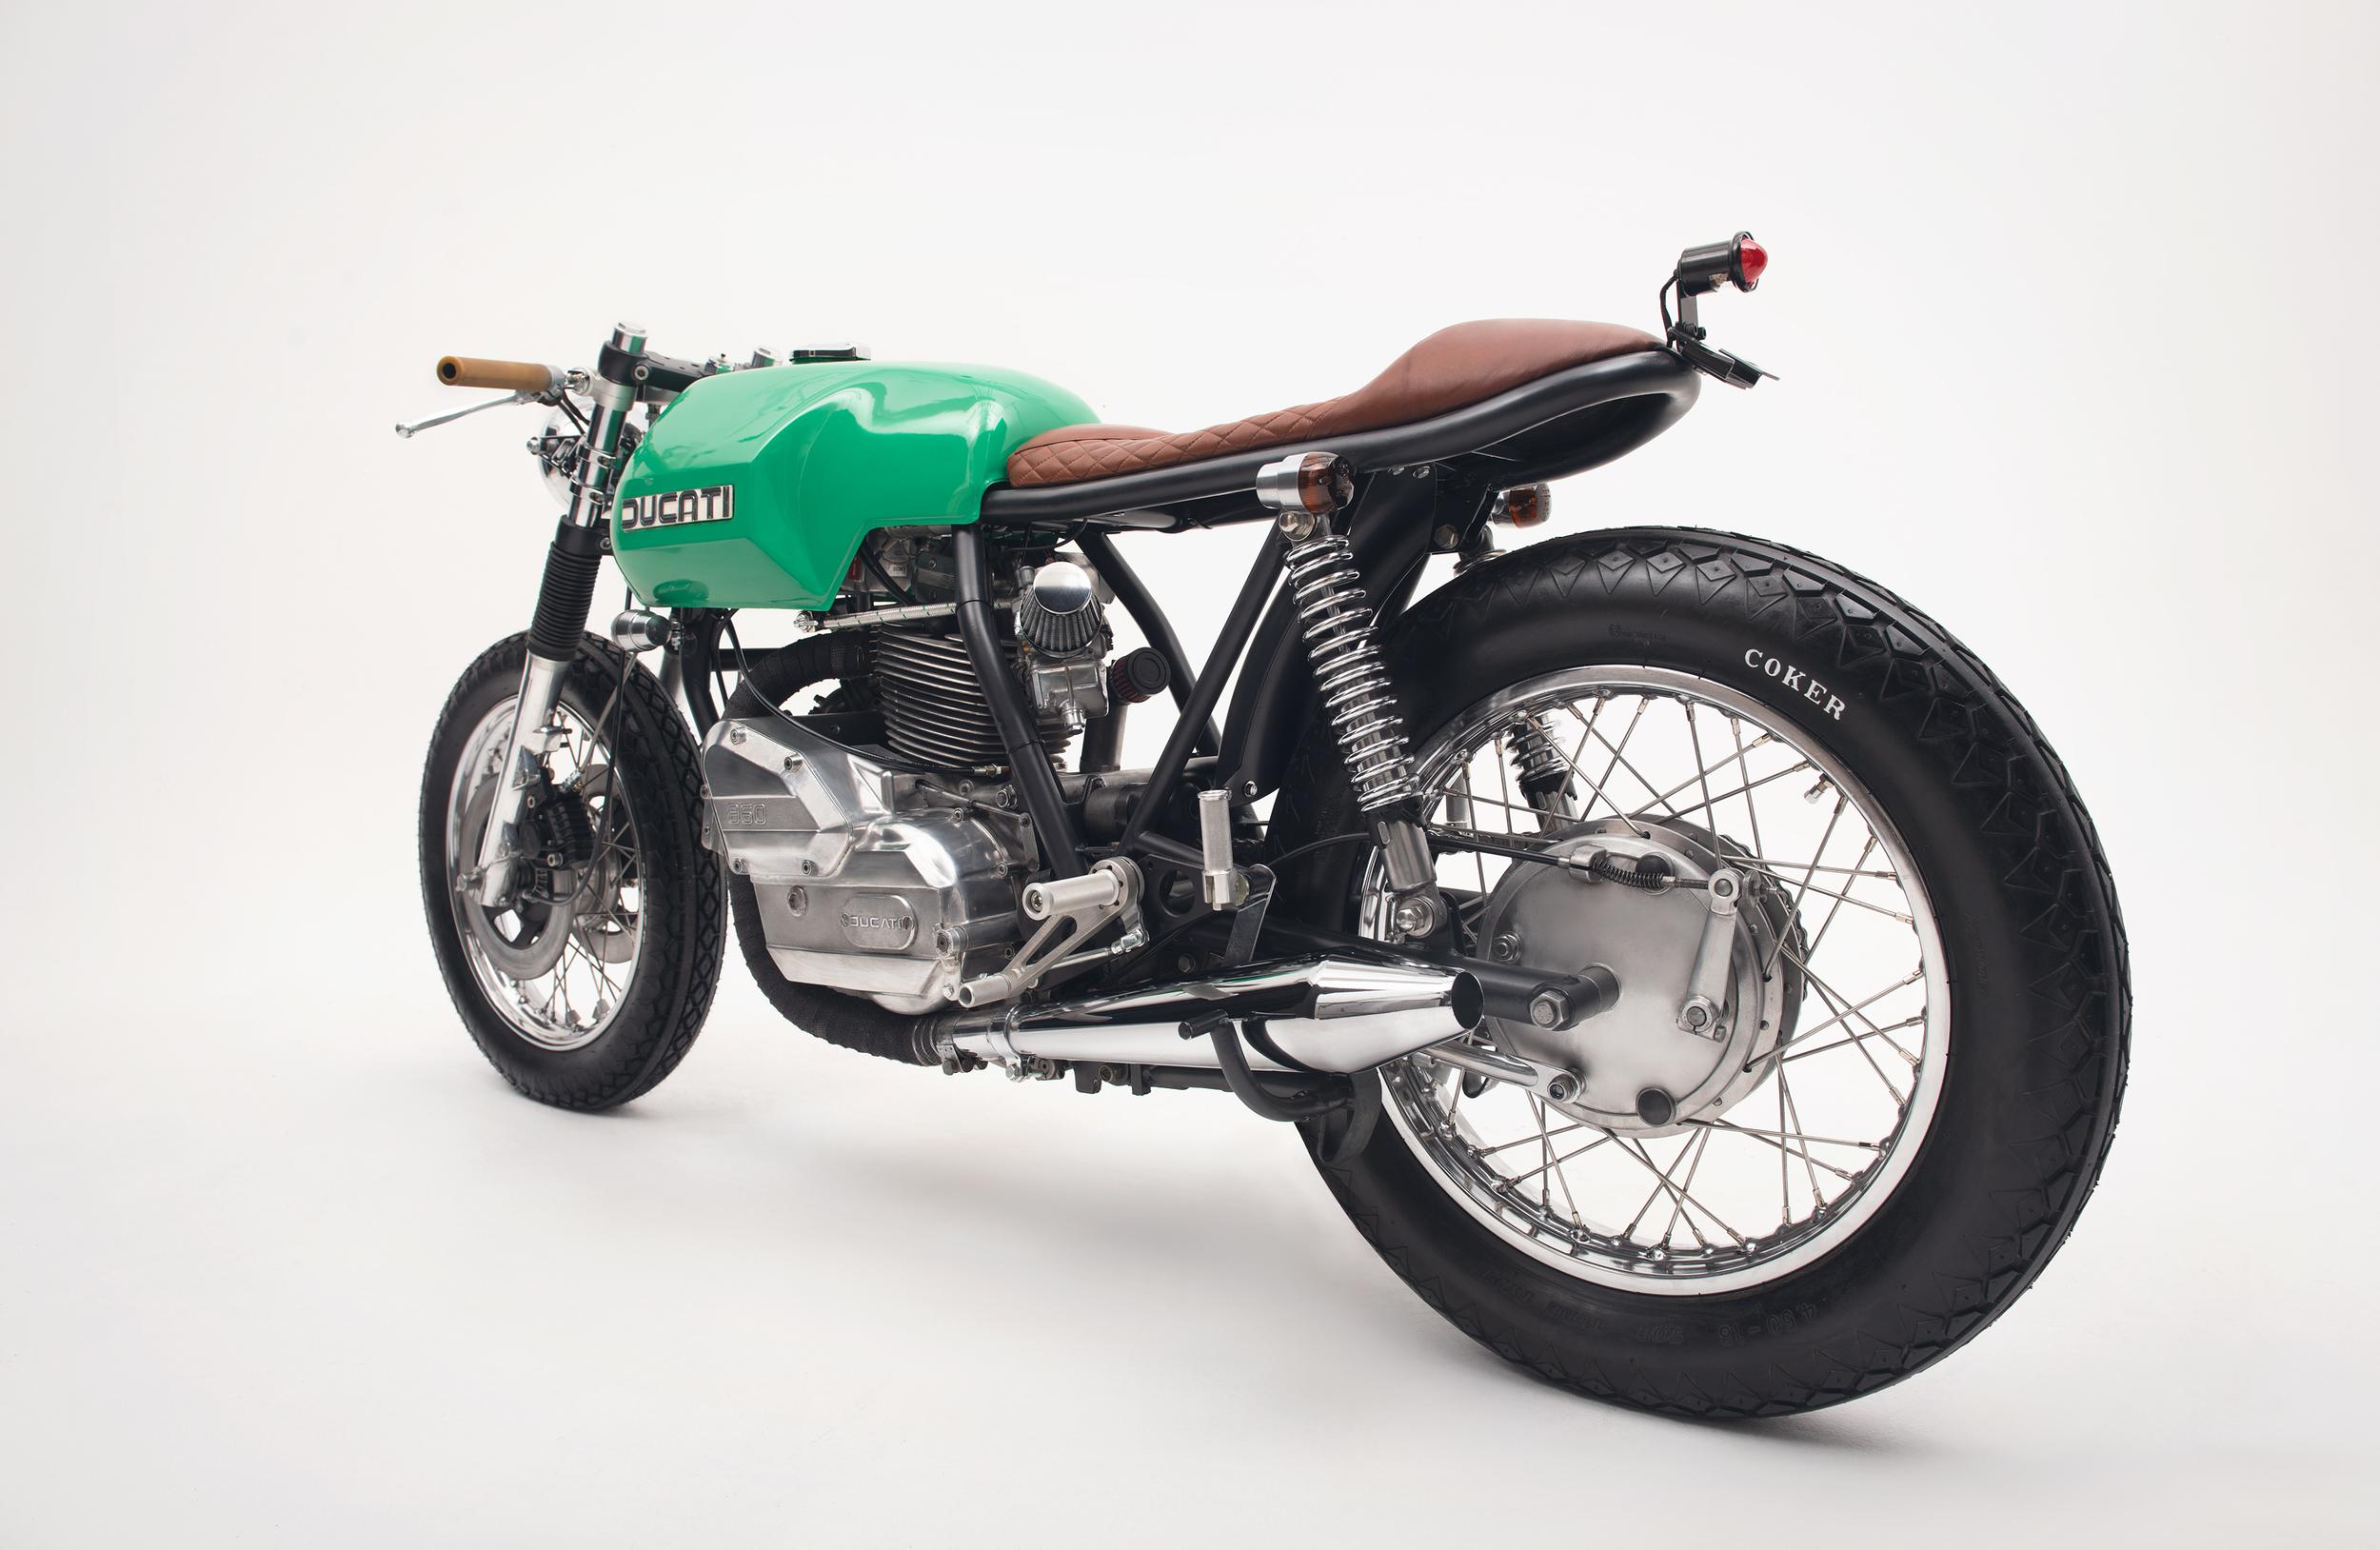 654Motors_Ducati_860_GTS_76_LowRes_01.jpg